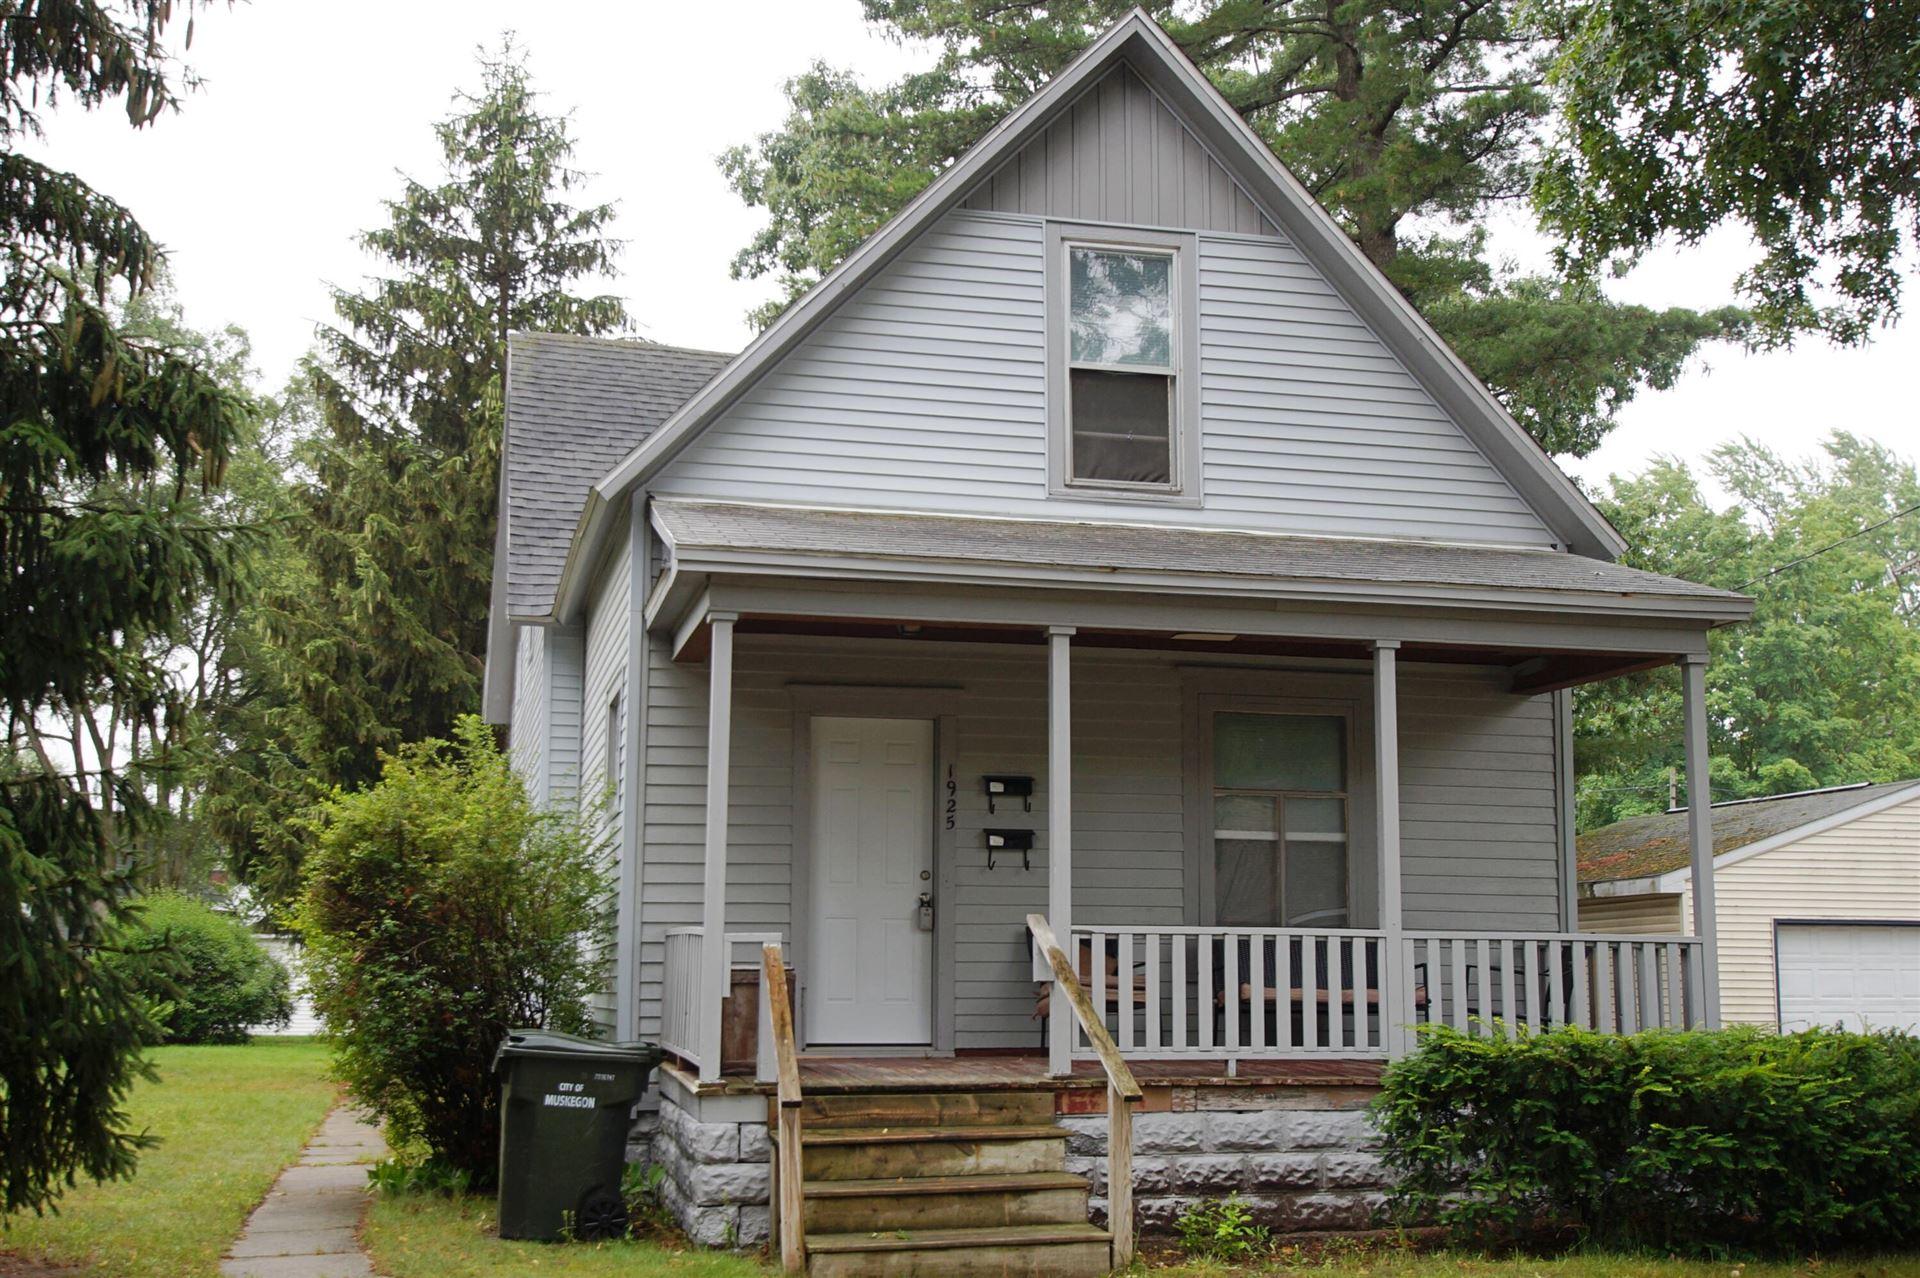 1925 Harding Avenue, Muskegon, MI 49441 - MLS#: 21033675